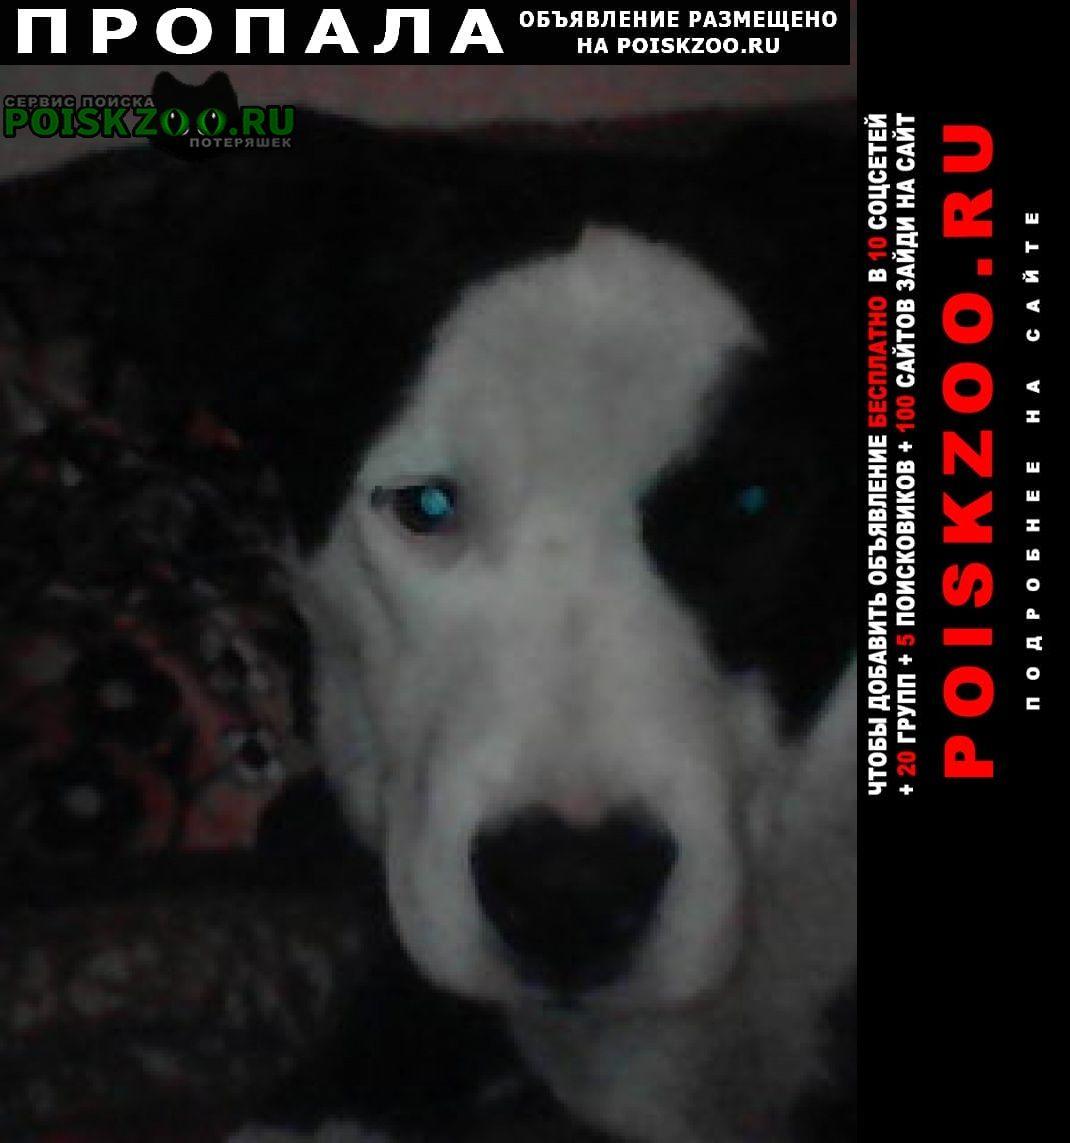 Пропала собака кобель неделю назад собака, зовут бим Макеевка